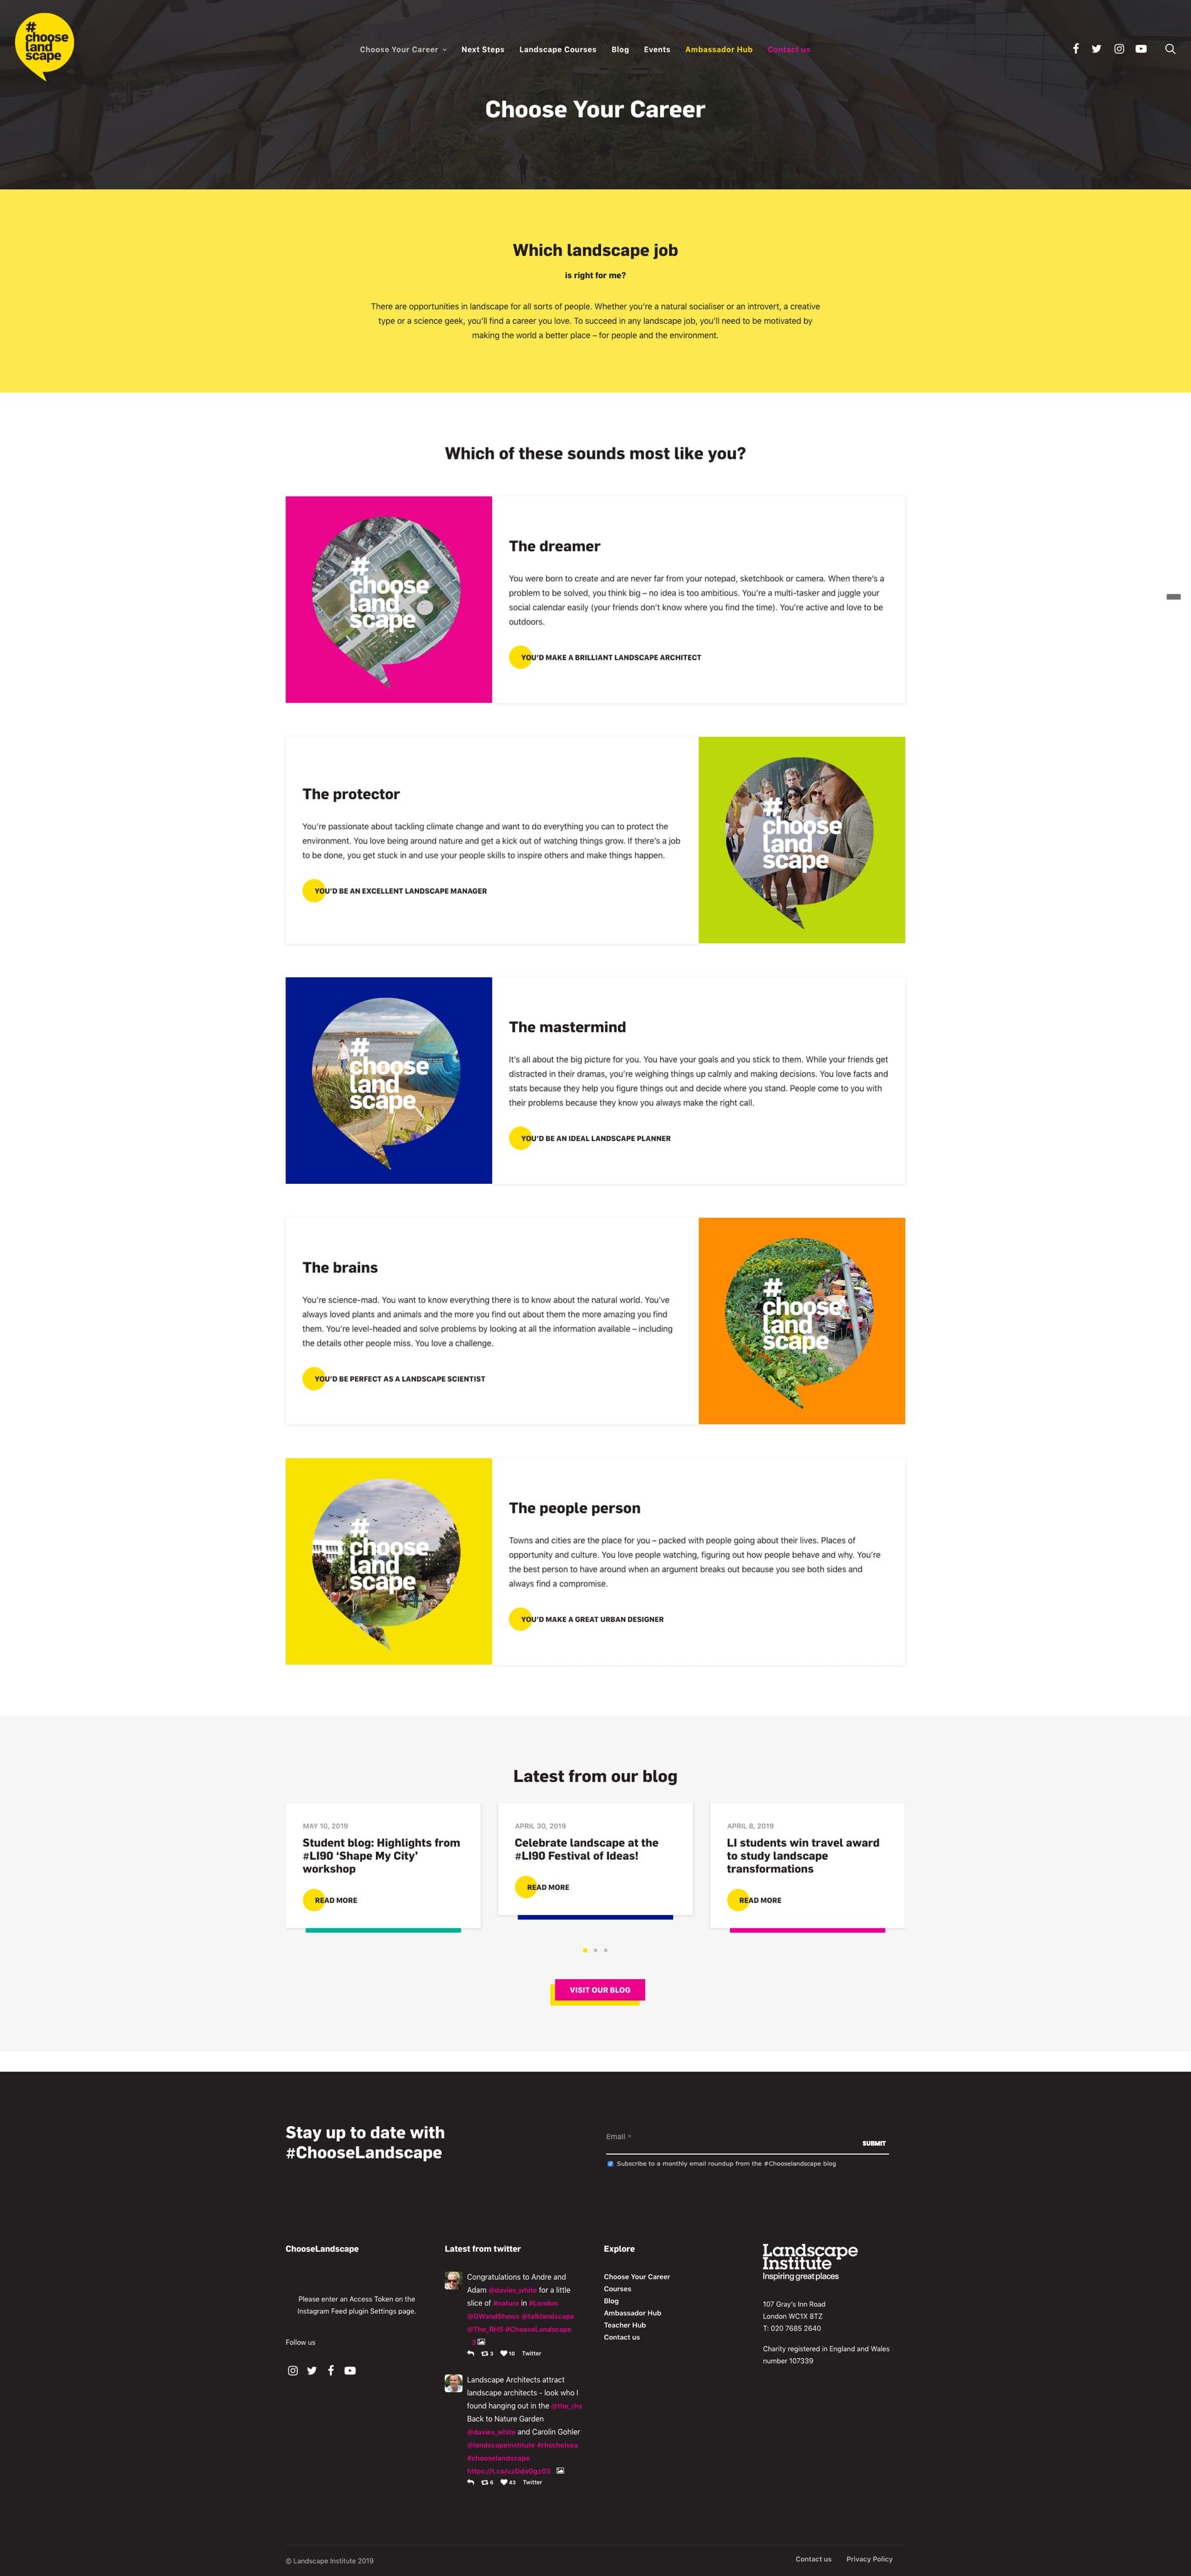 chooselandscape career campaign website case study northwest agency